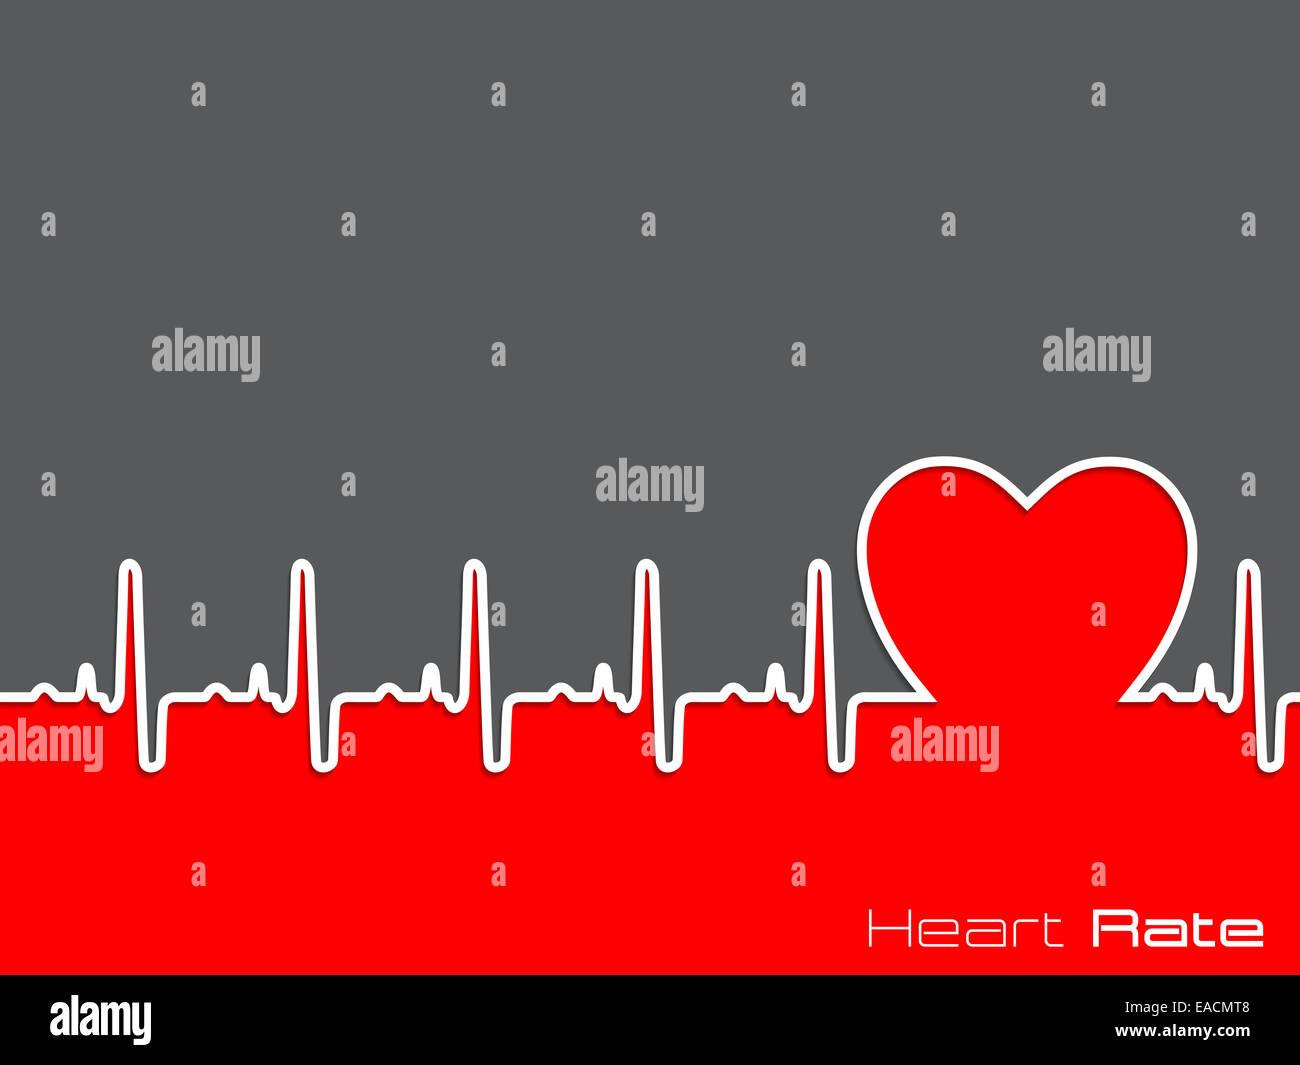 Medical background design with ekg diagram and heart shape stock medical background design with ekg diagram and heart shape pooptronica Images